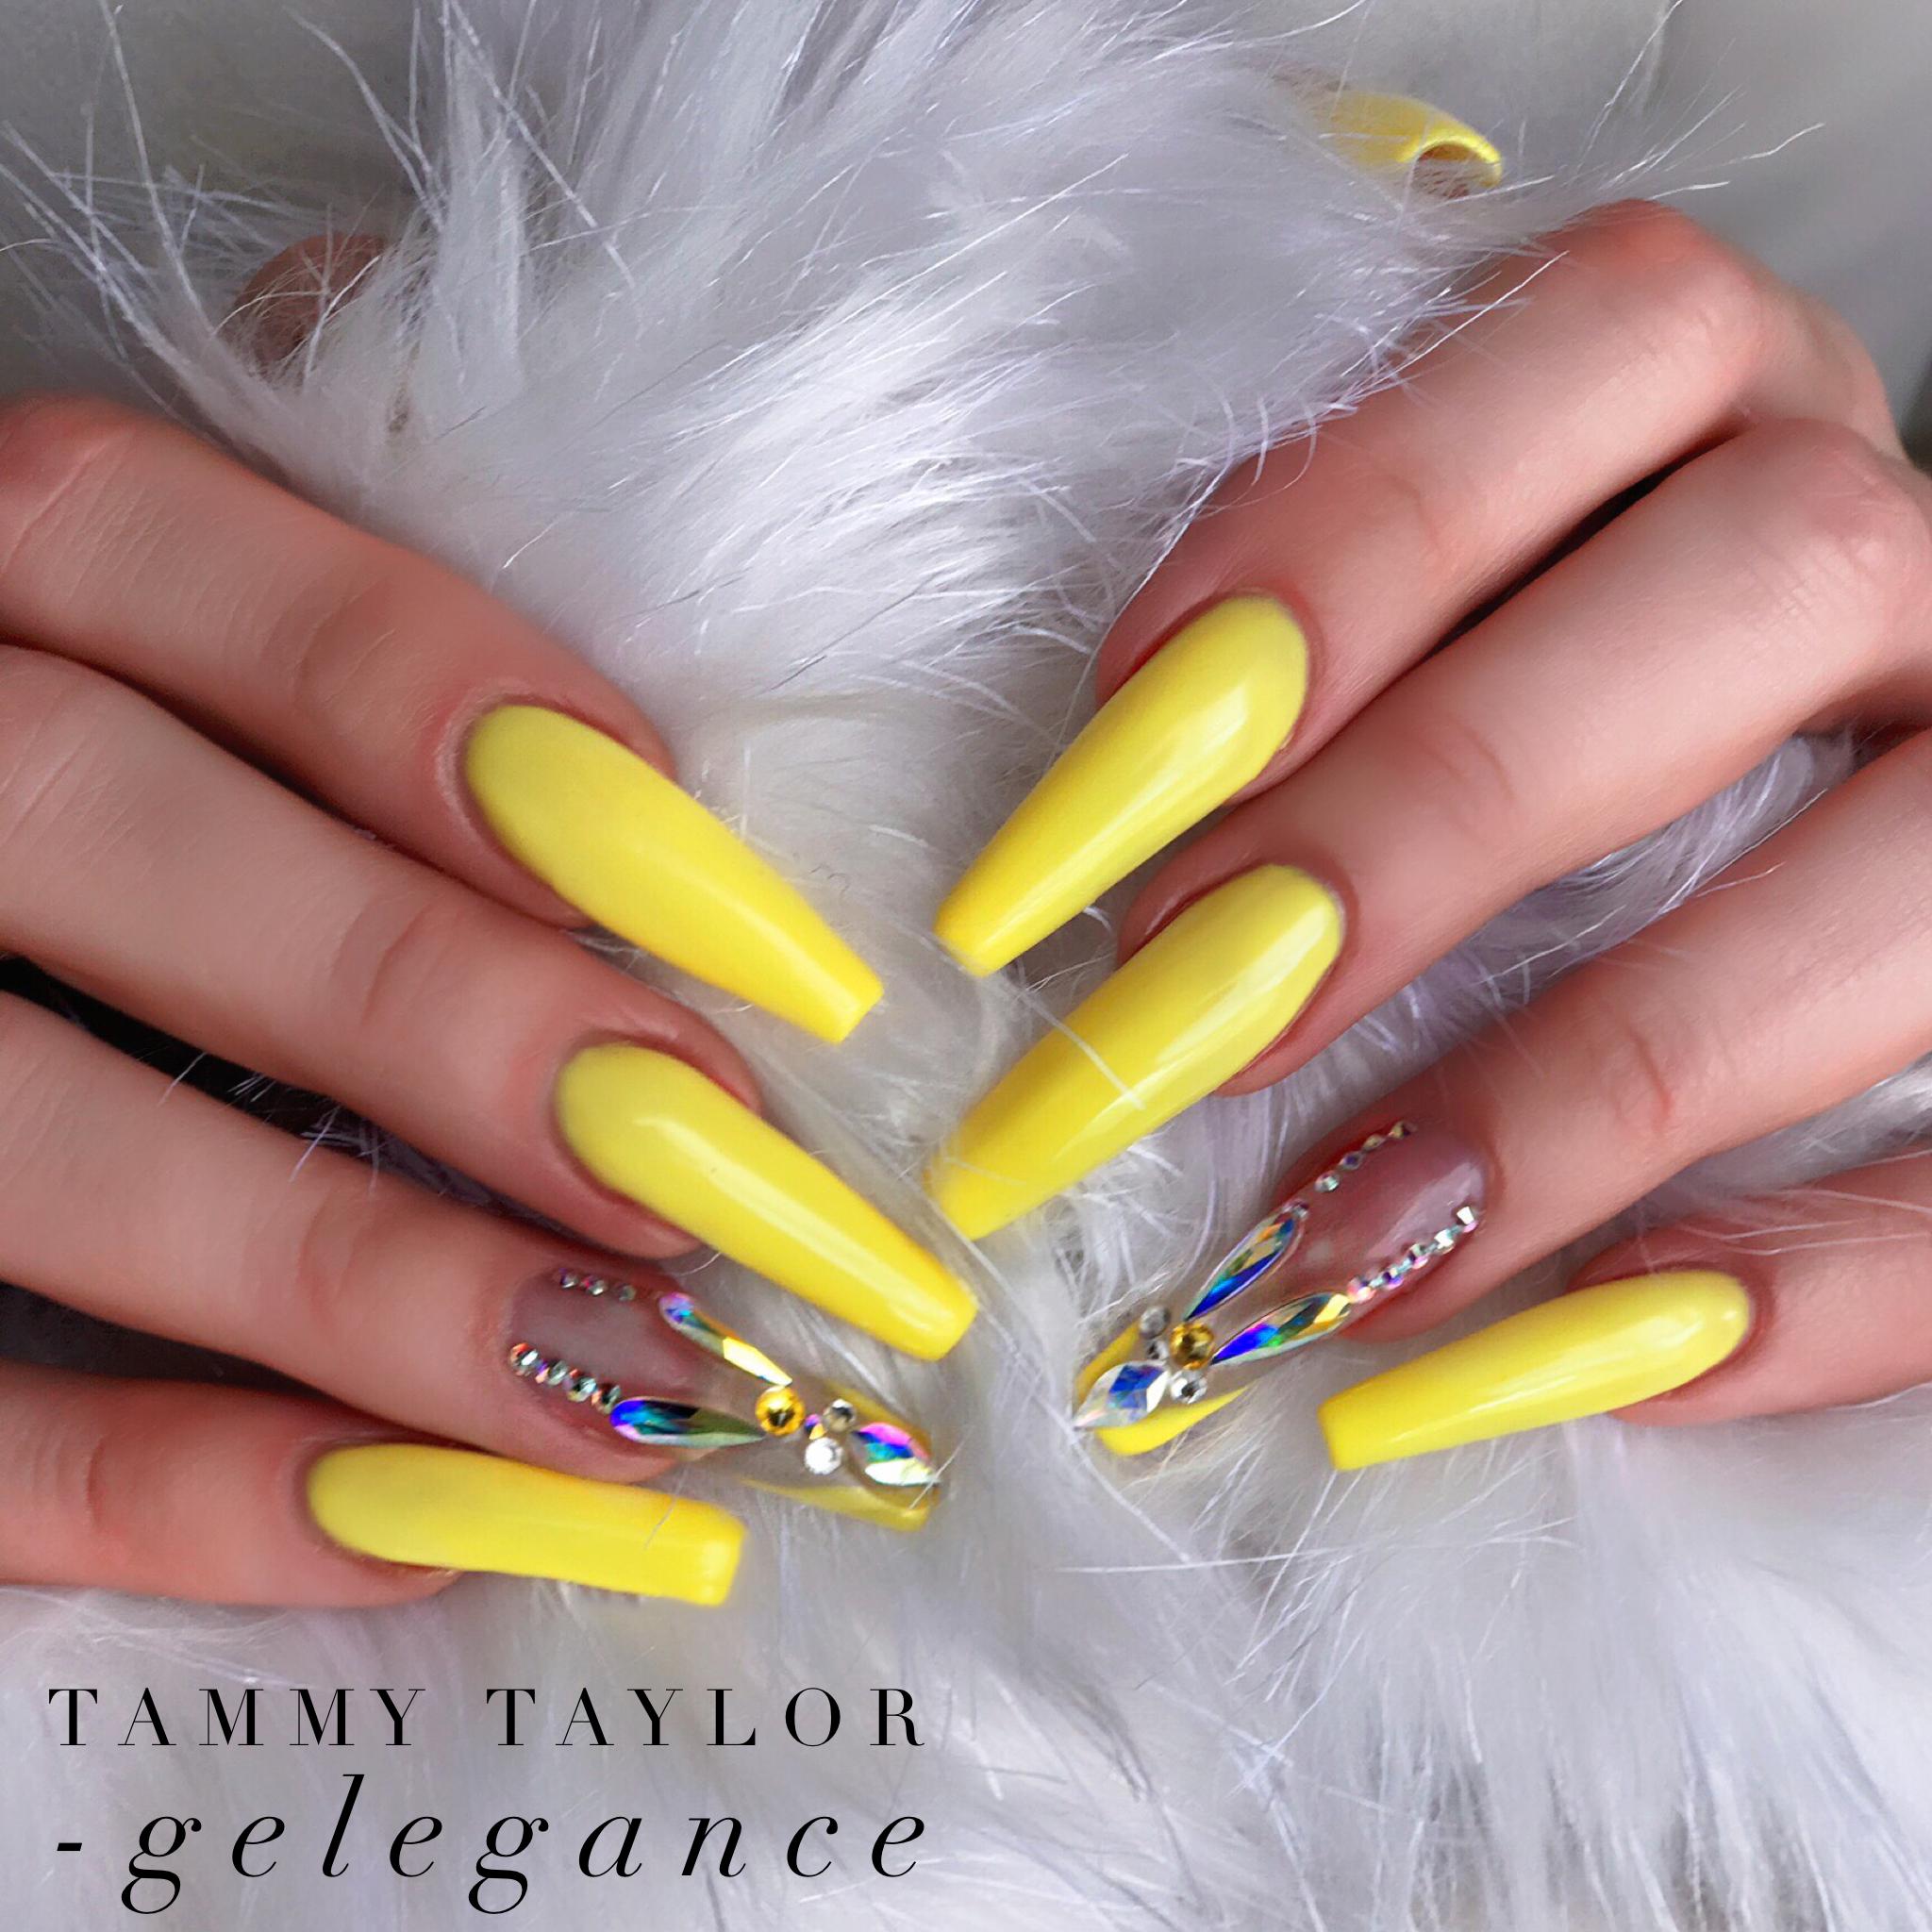 Tammy Taylor Moreleta Has It All Using Crystal Clear Competitive Edge Acrylic And Sunshine Coast Gelega Nail Designs Bling Tammy Taylor Nails Swarovski Nails